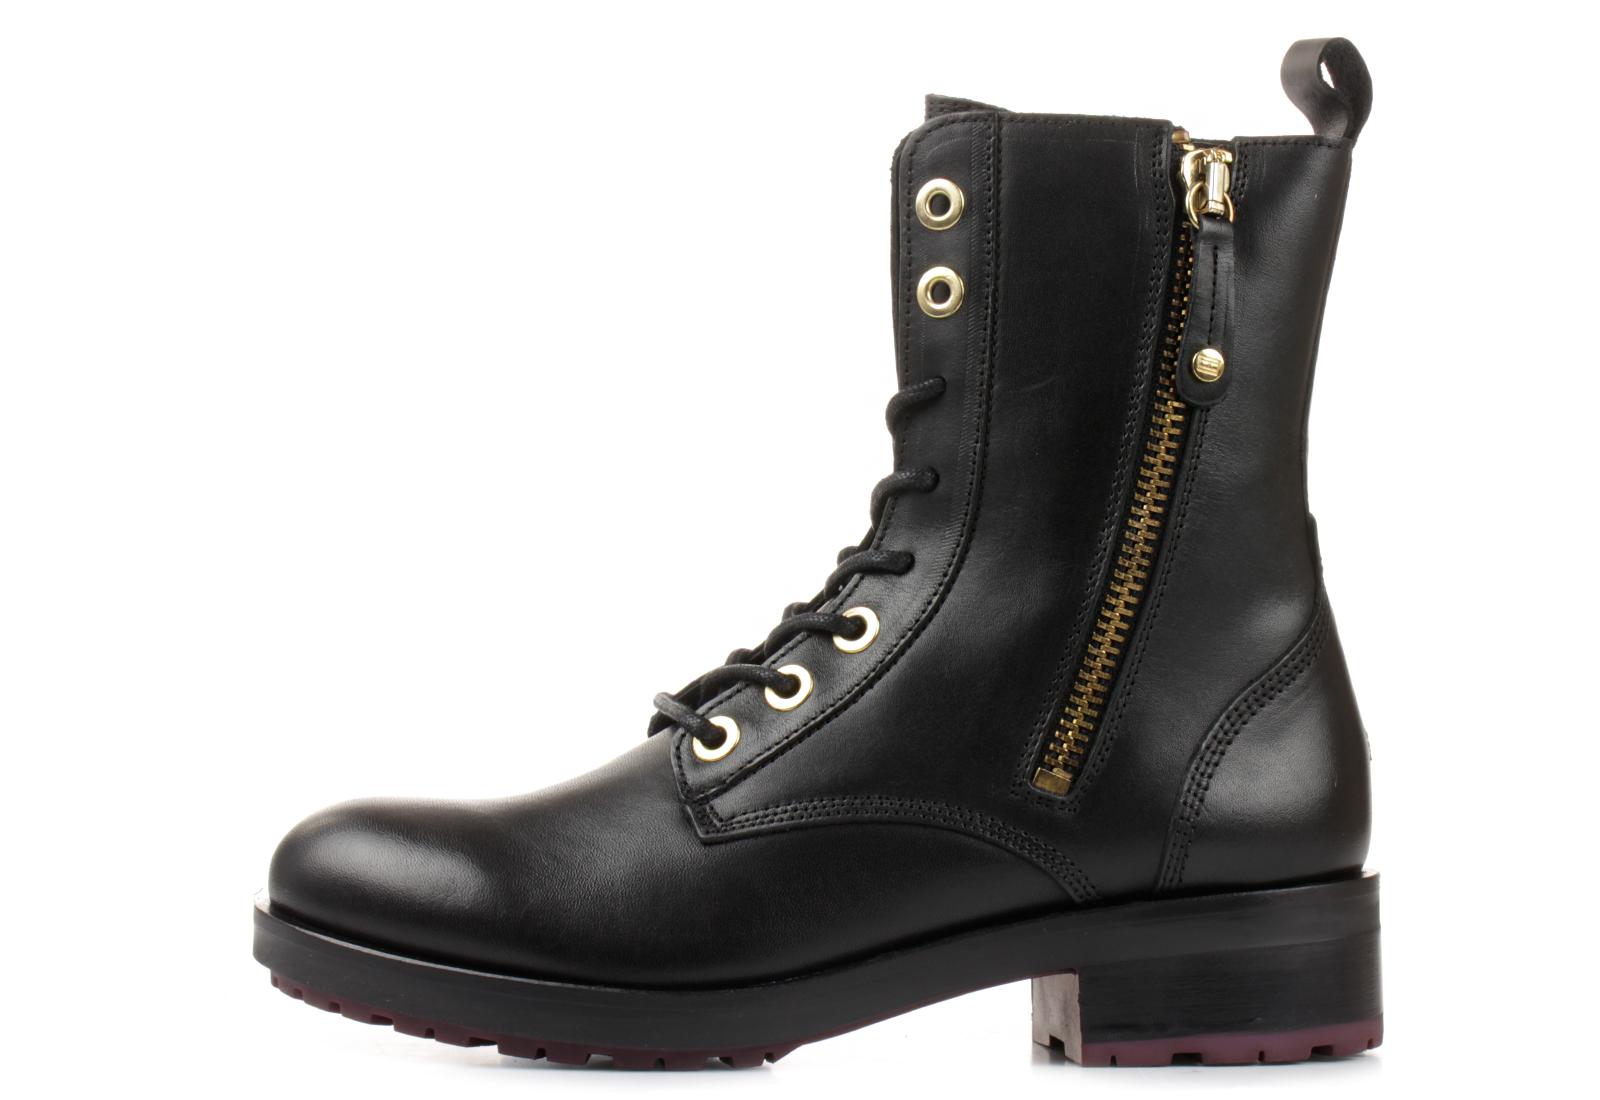 tommy hilfiger boots jill 1a 17f 1547 990 online. Black Bedroom Furniture Sets. Home Design Ideas